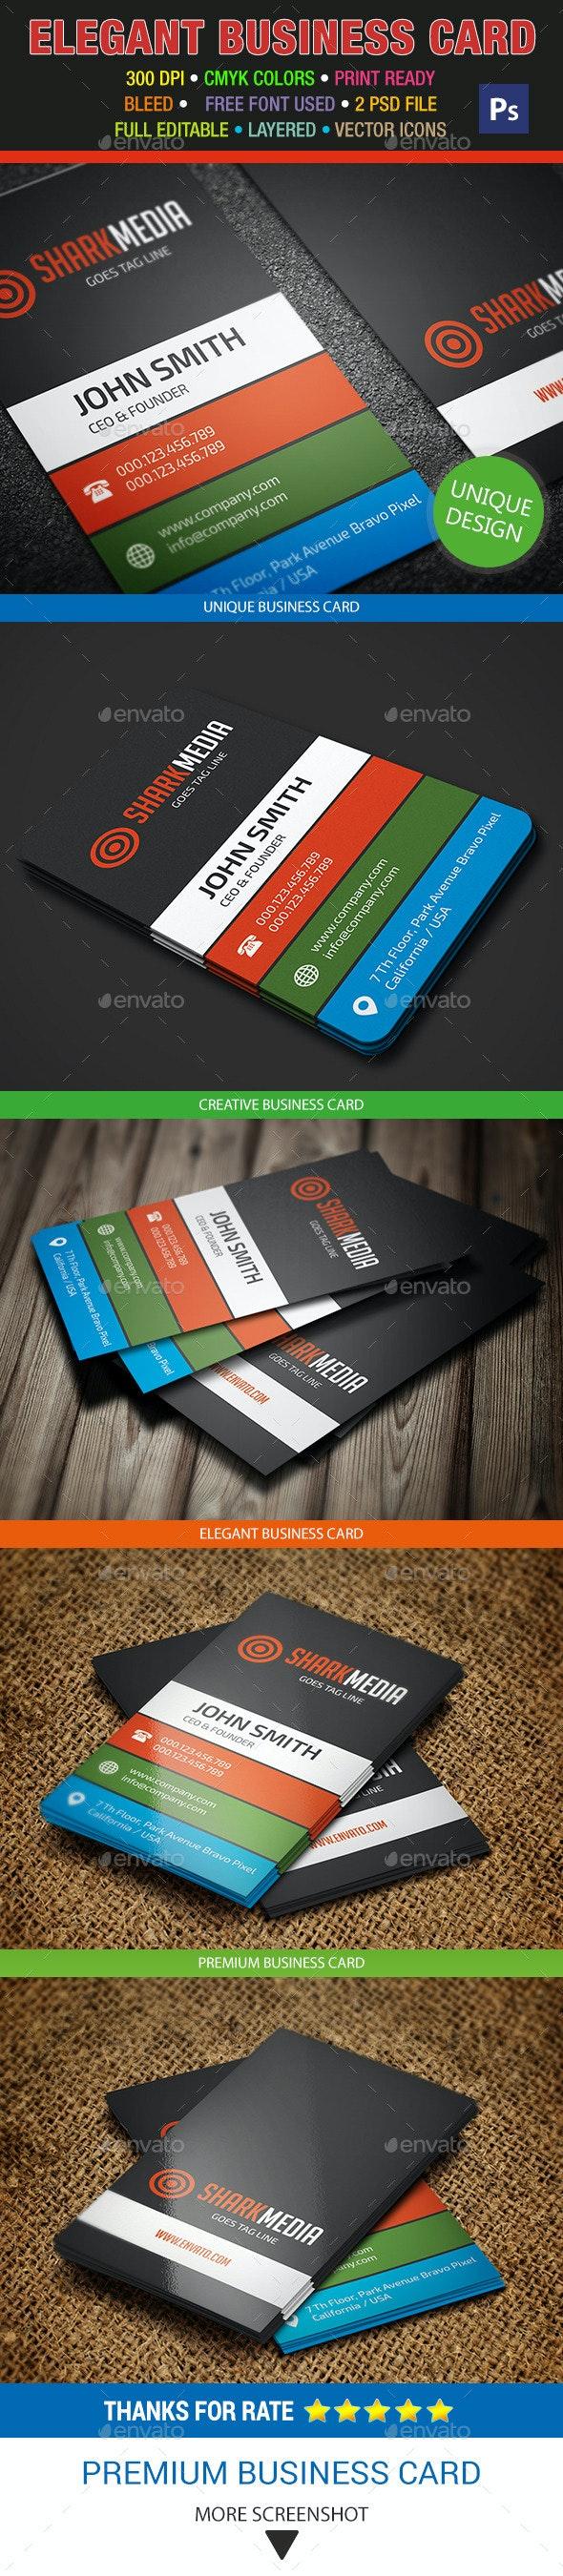 Elegant Business Card 321 - Creative Business Cards